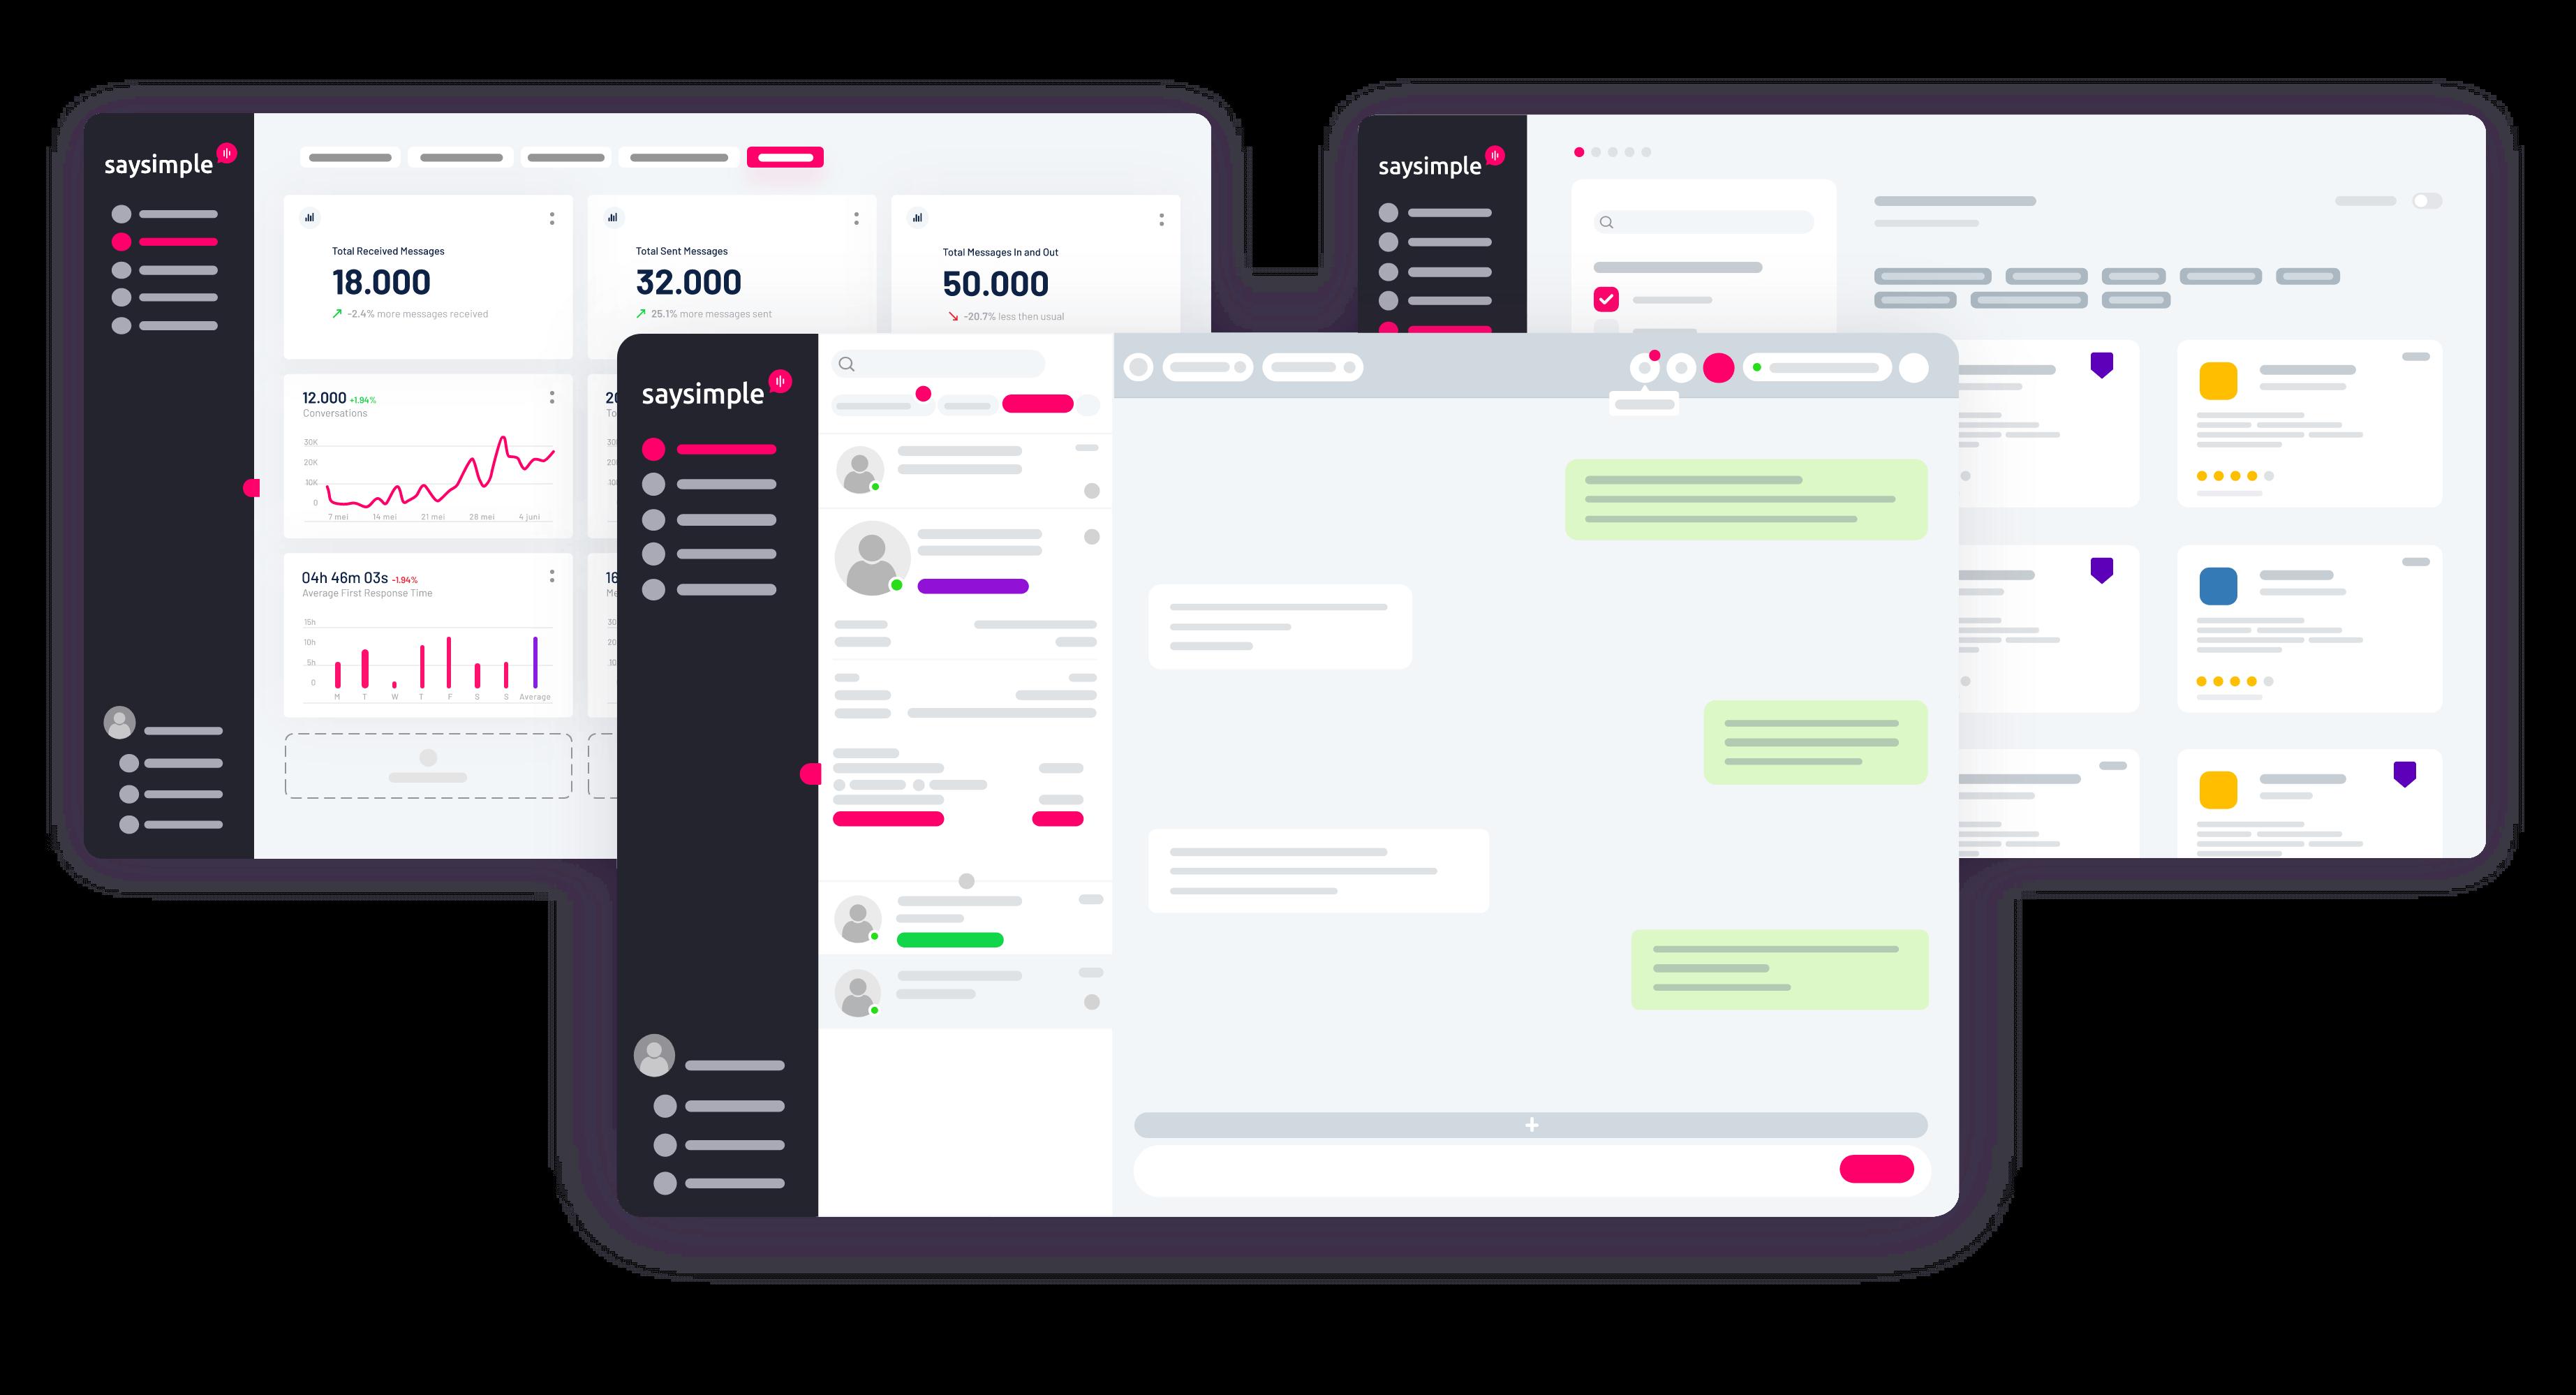 Inbox, Insights, Marketplace